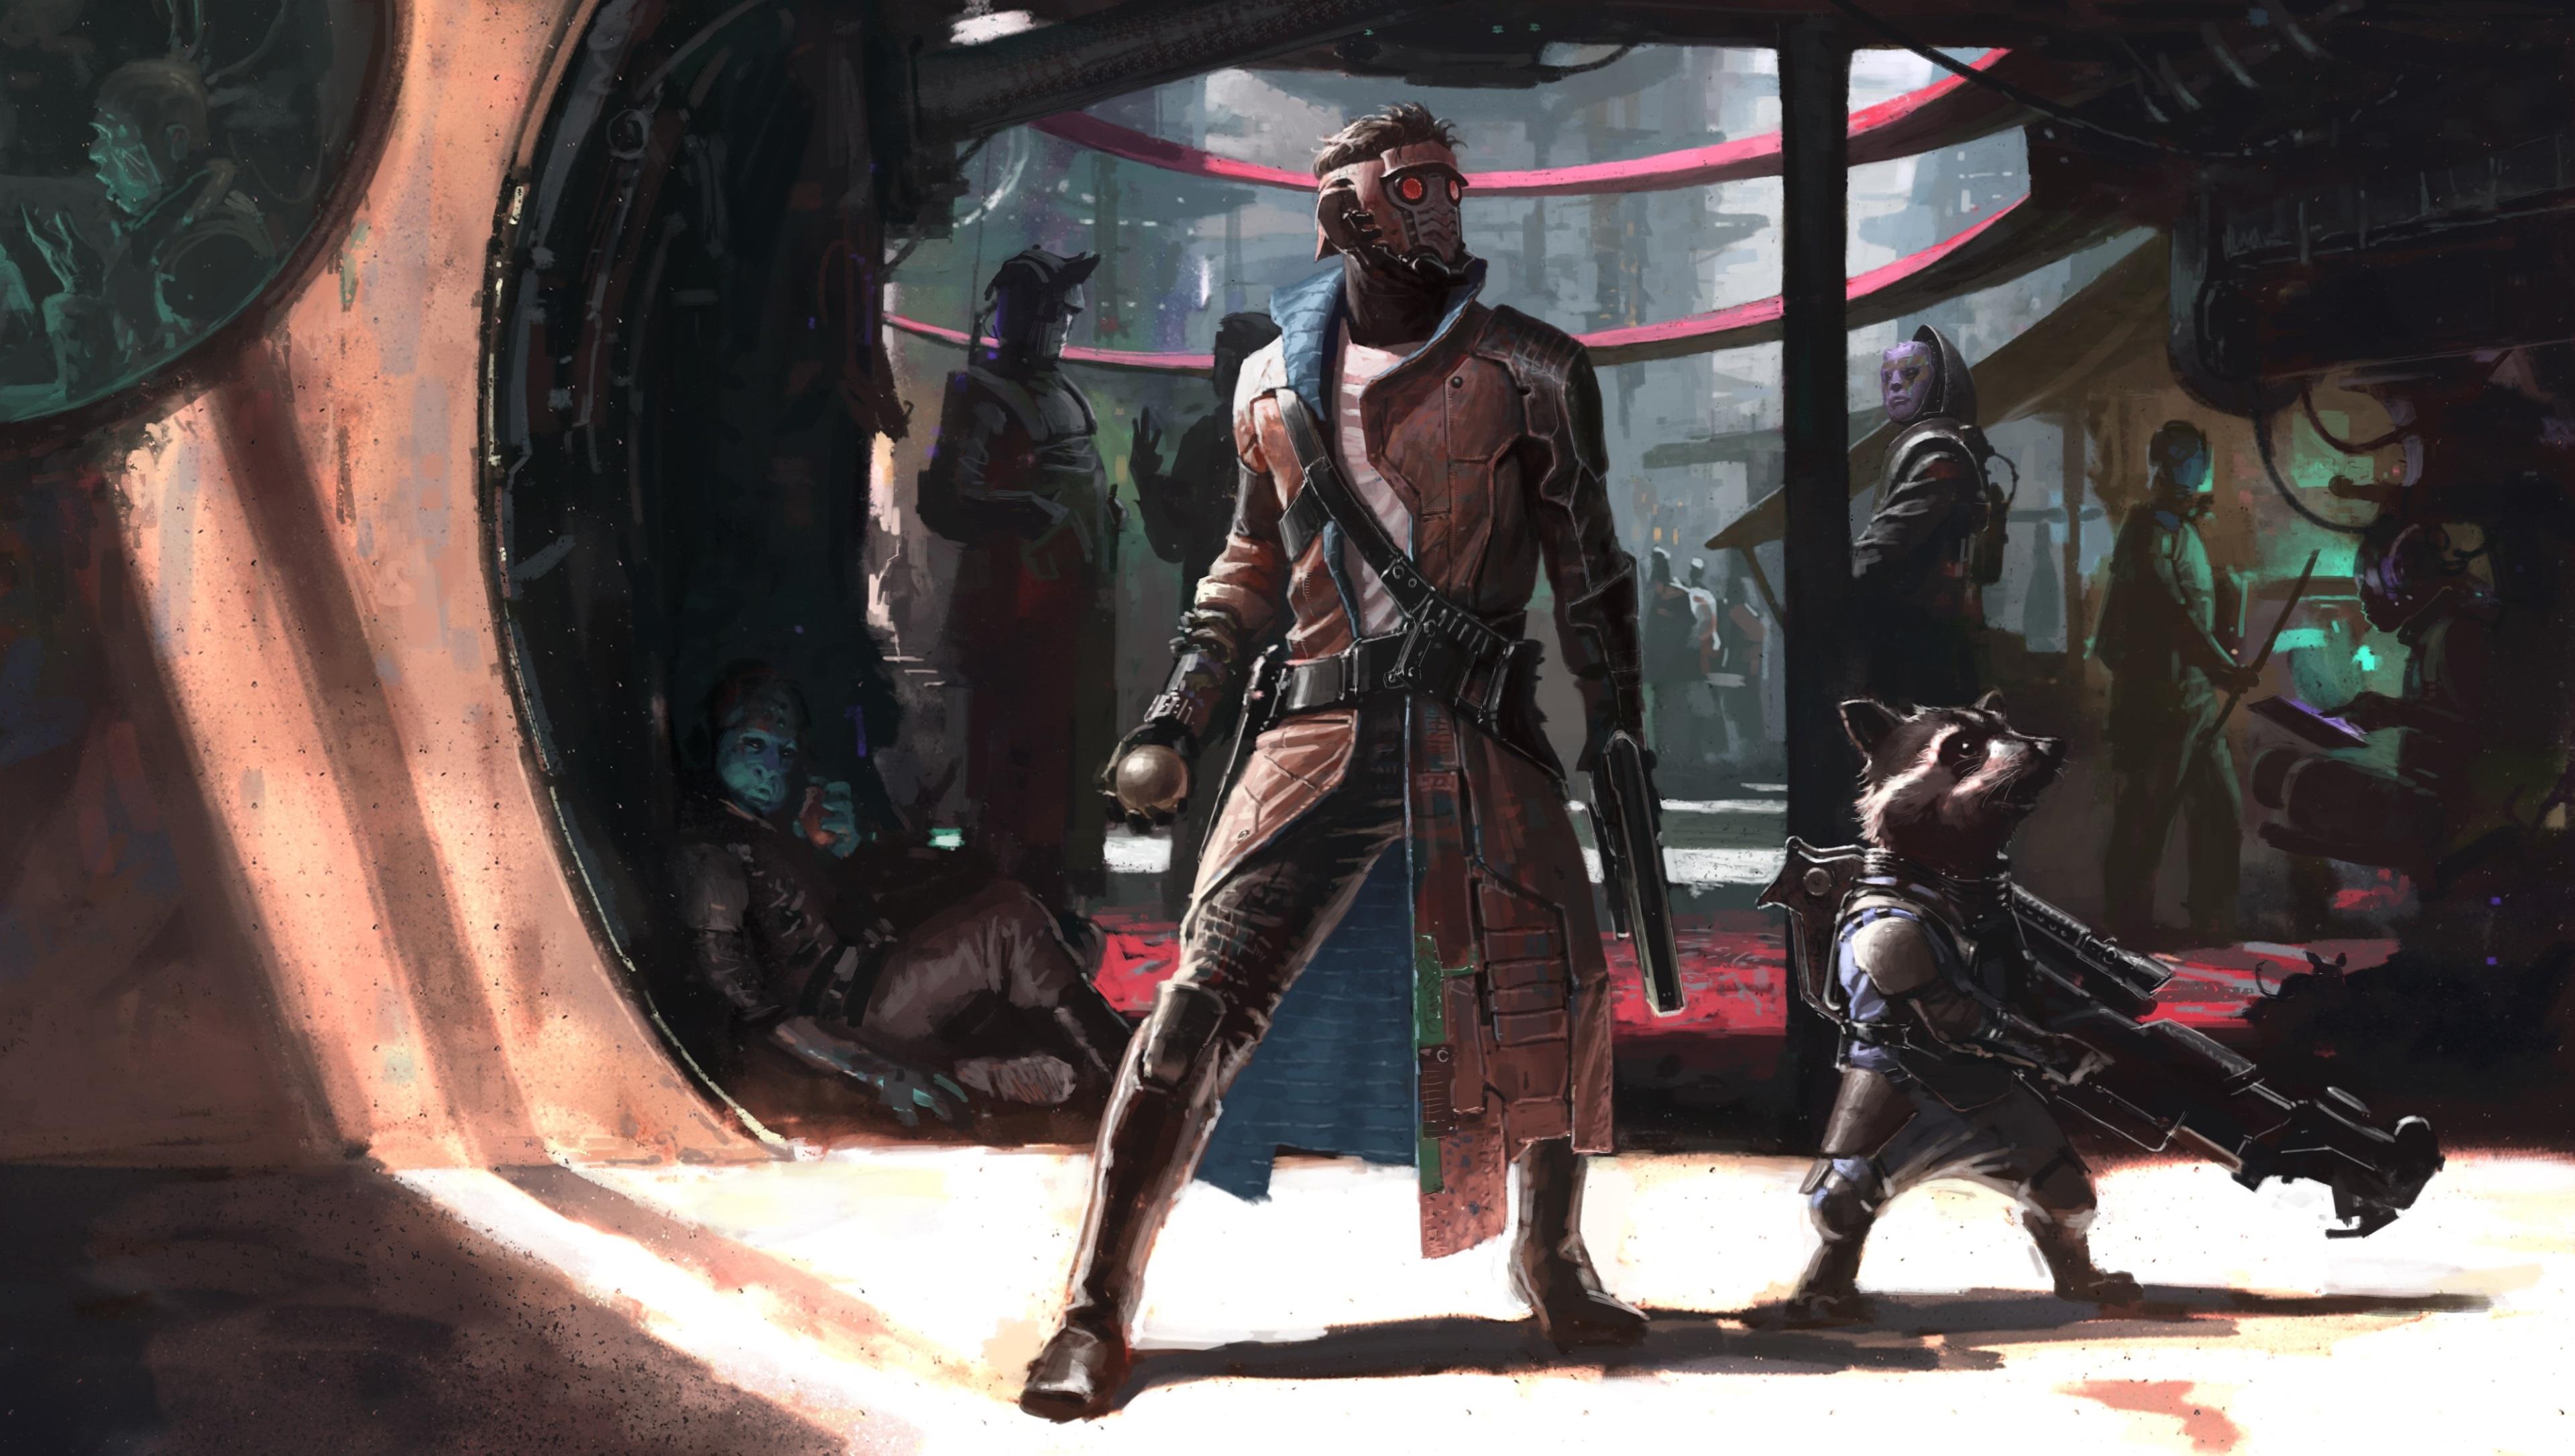 Guardianes De La Galaxia 4k Hr Wallpaper - Star Lord And Rocket , HD Wallpaper & Backgrounds